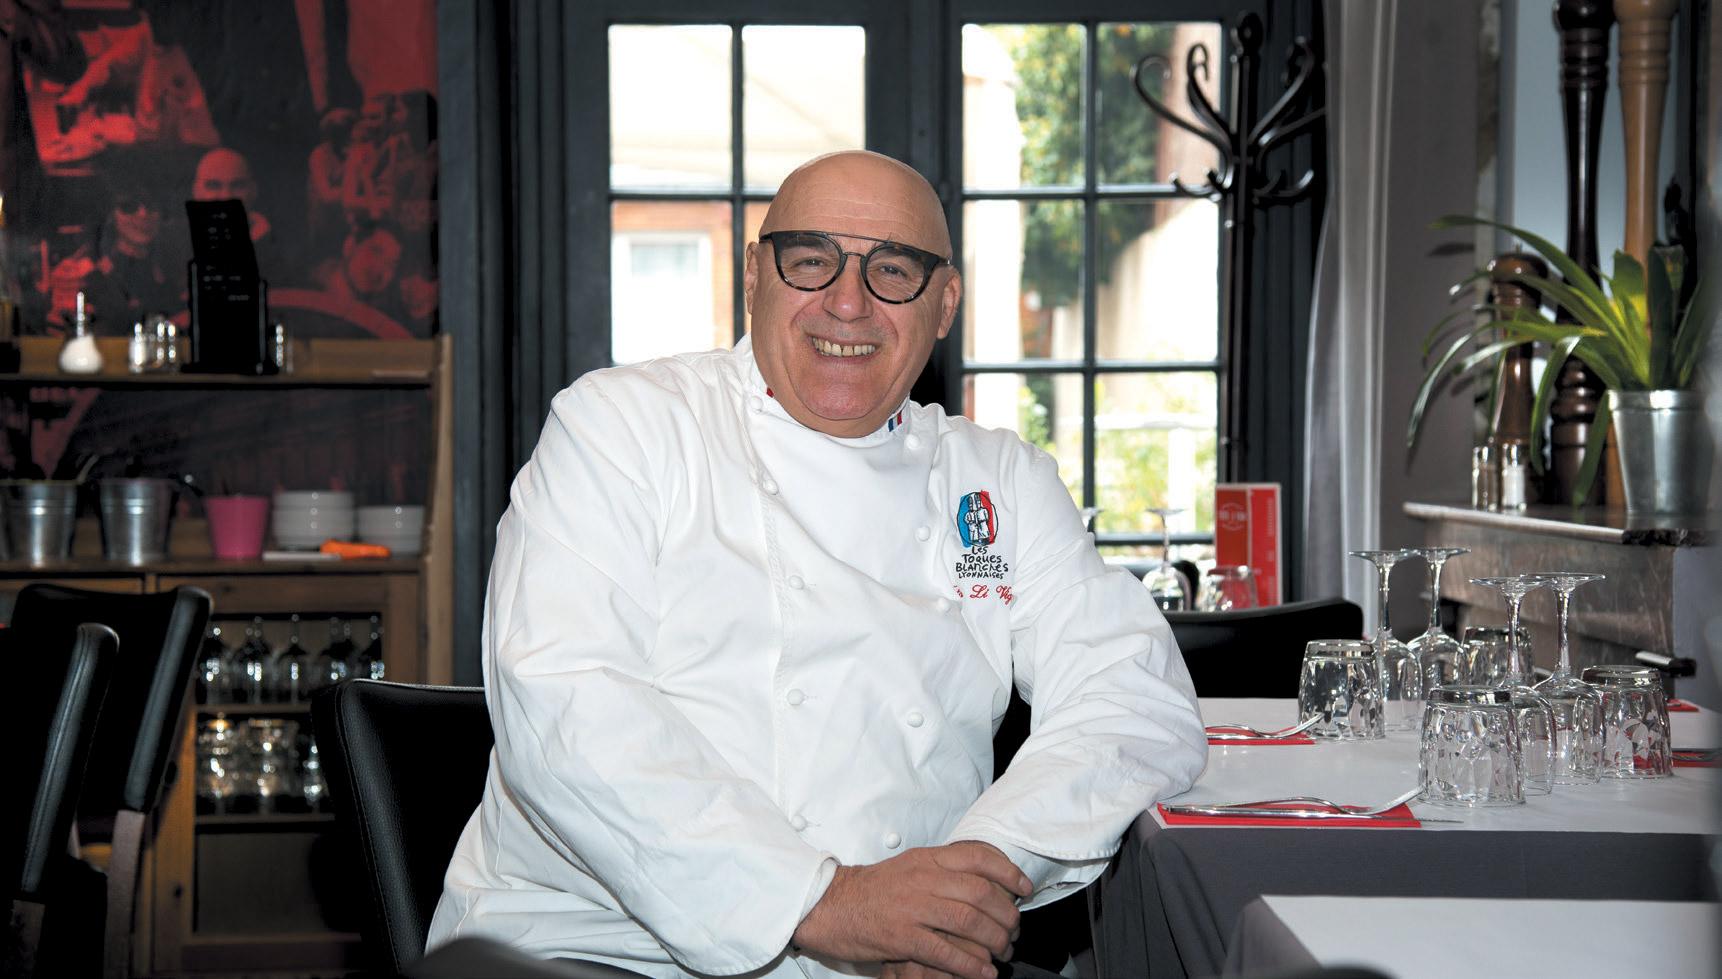 Restaurant Ristorante Toto LI VIGNI - Toto LI VIGNI